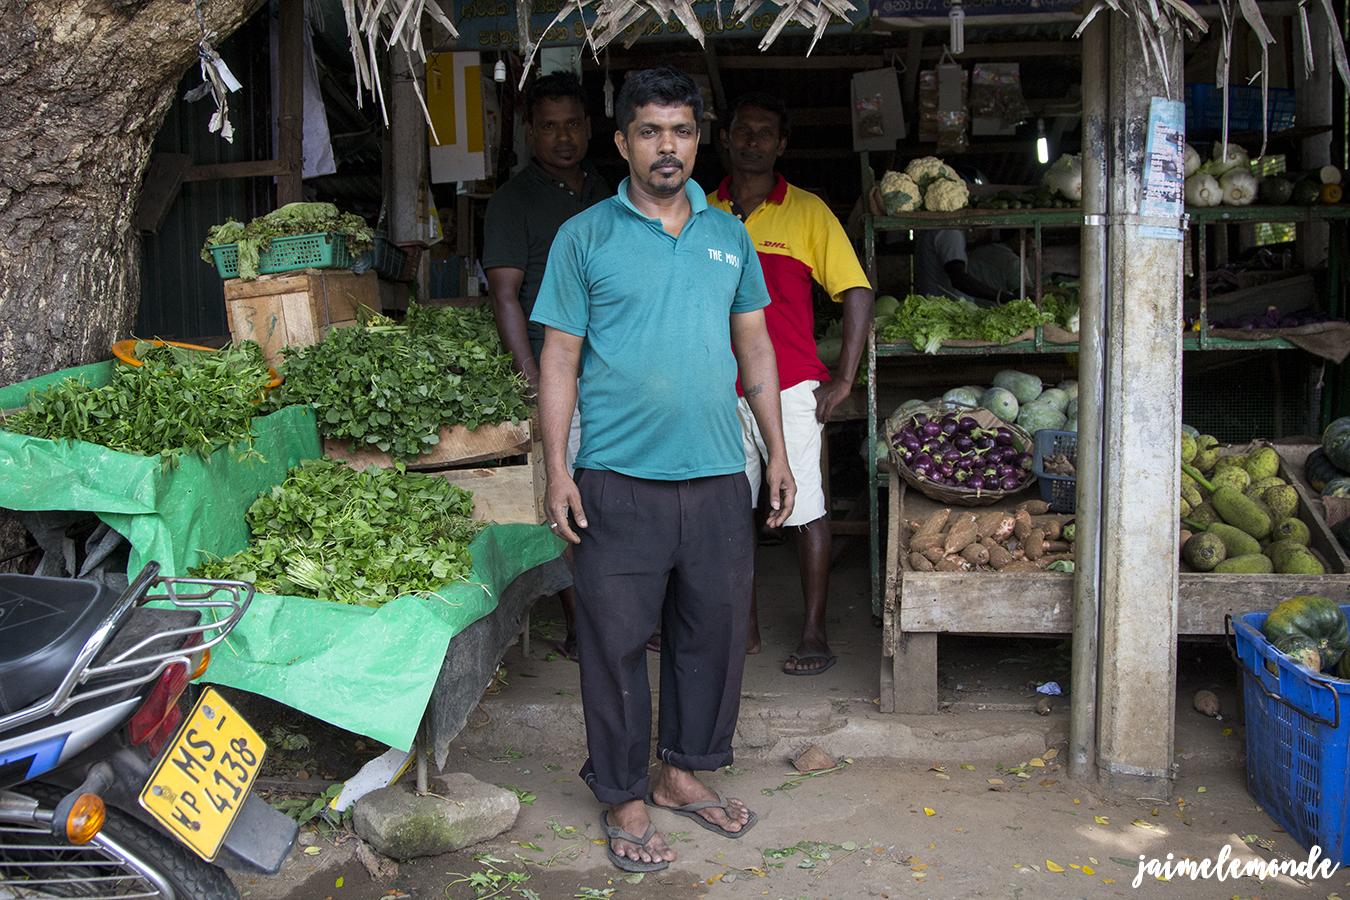 negombo-apprendre-a-cuisiner-avec-ragu-negombo-beach-house-guest-house-voyage-au-sri-lanka-jaimelemonde-3